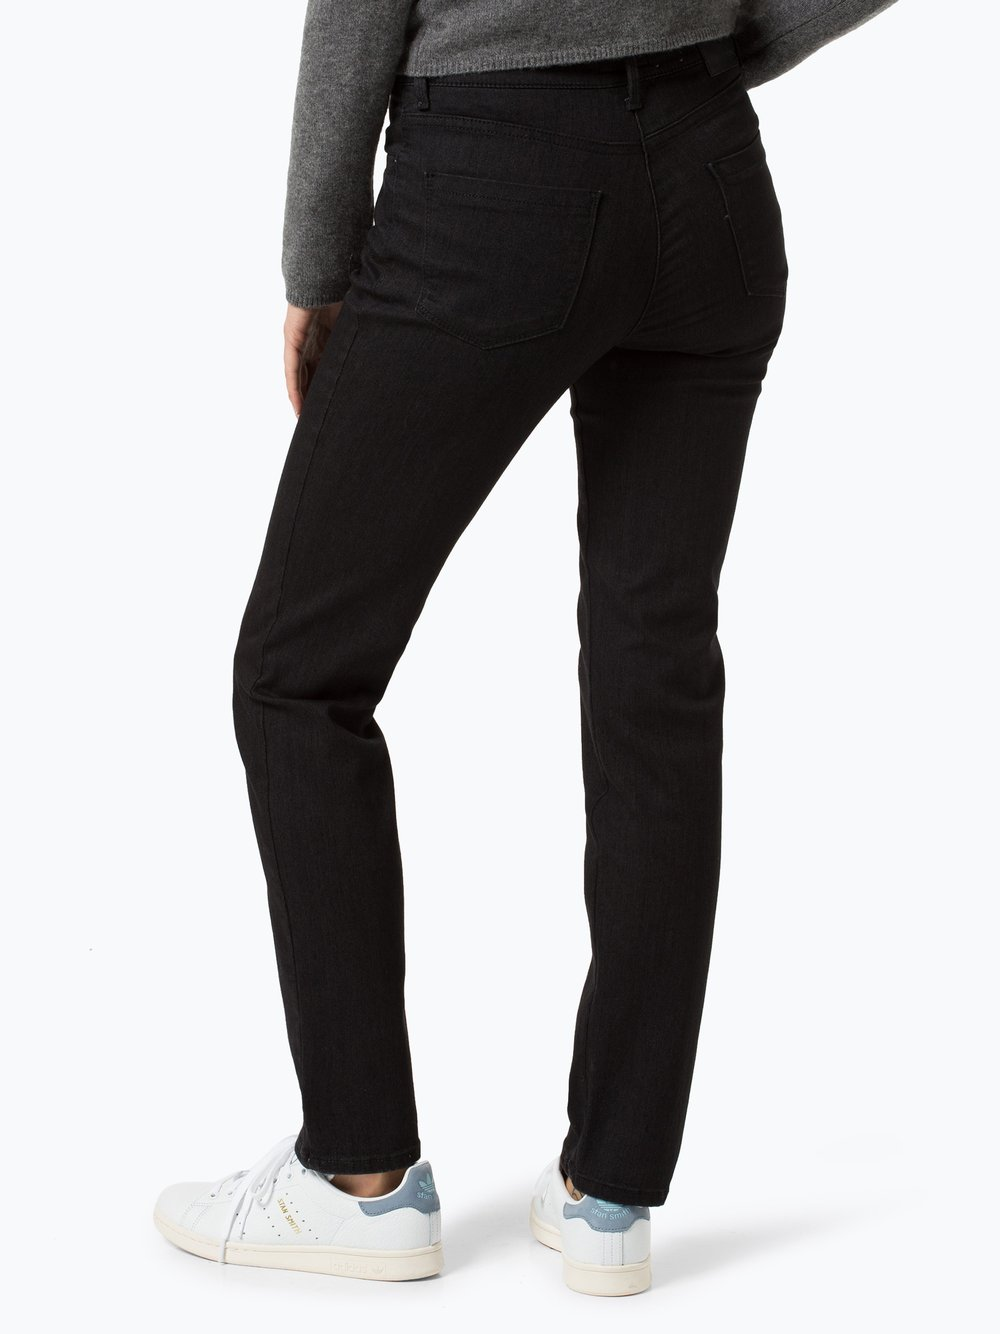 Damen Jeans - Sara schwarz Brax aEa16dh